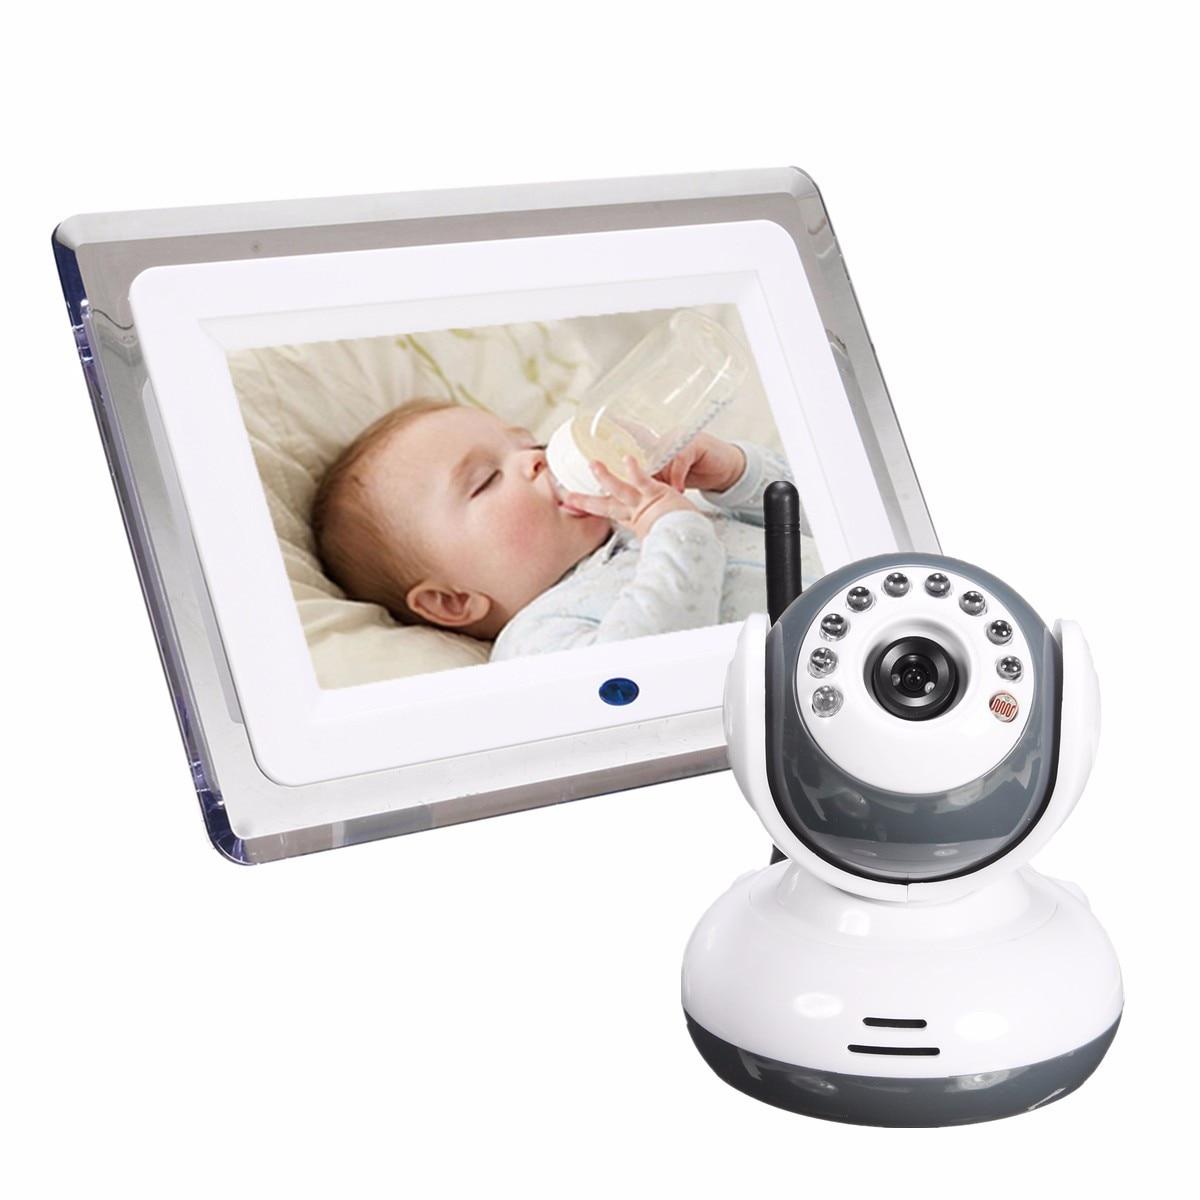 Safurance 2.4G Wireless Digital 7 LCD Baby Monitor Camera Audio Talk Video Night Vision Security Camera